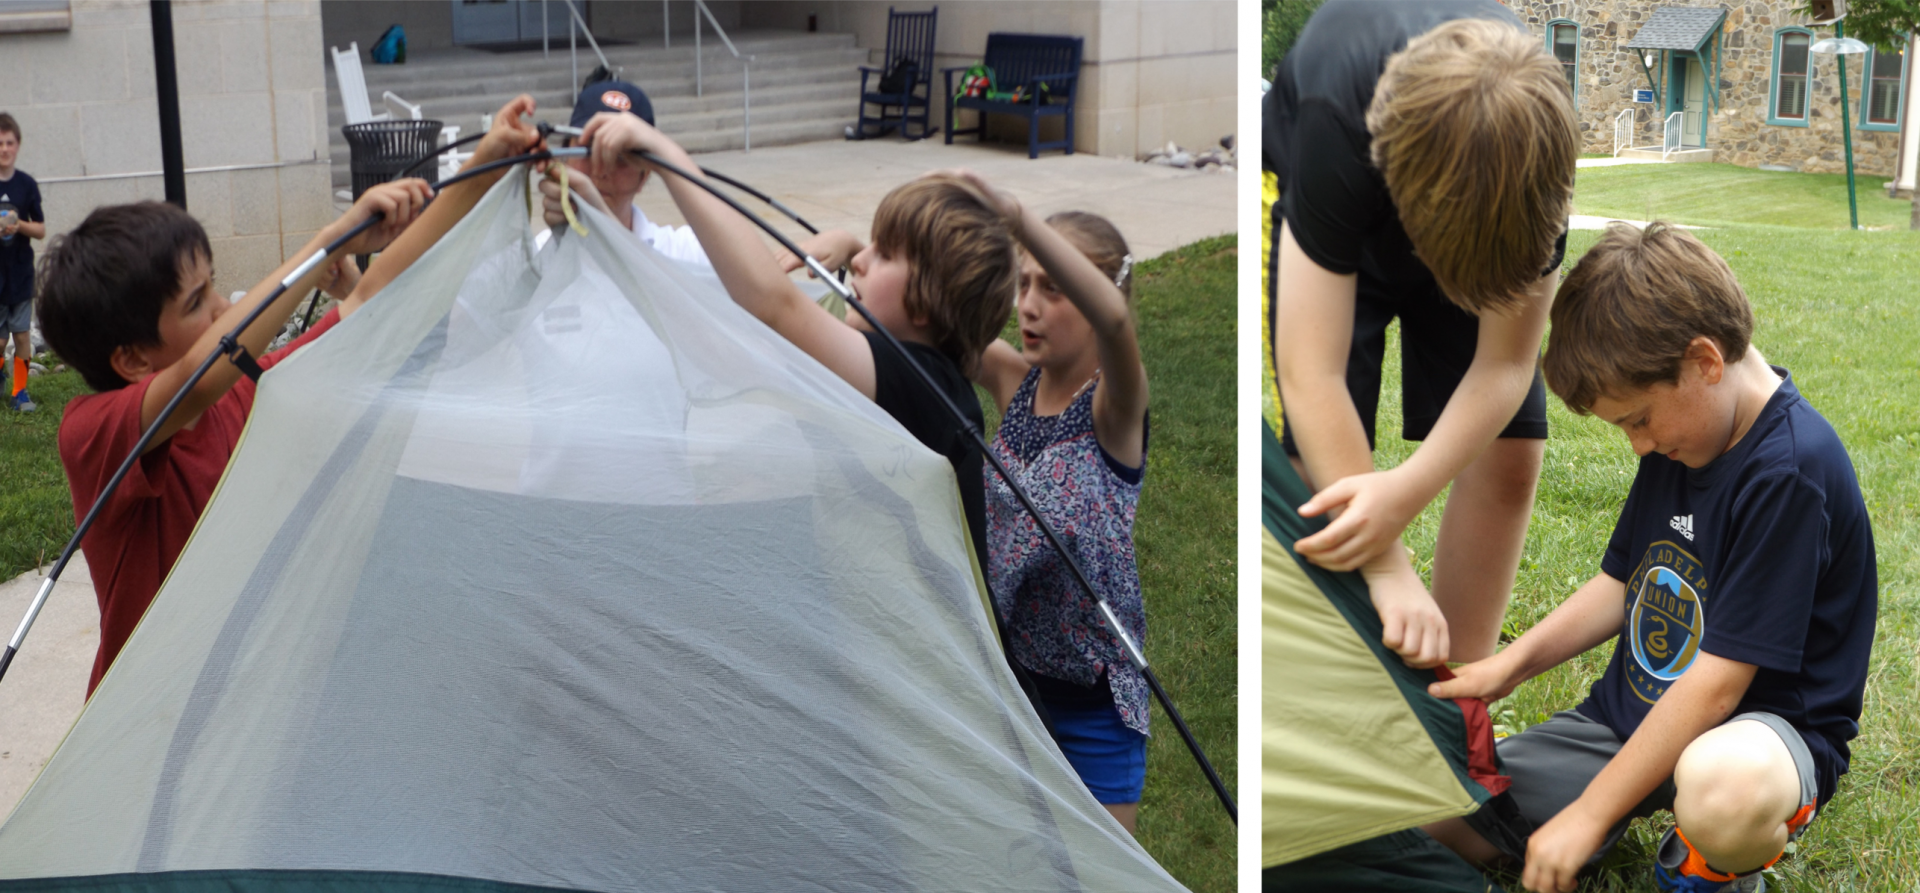 diy building a tent episcopal academy